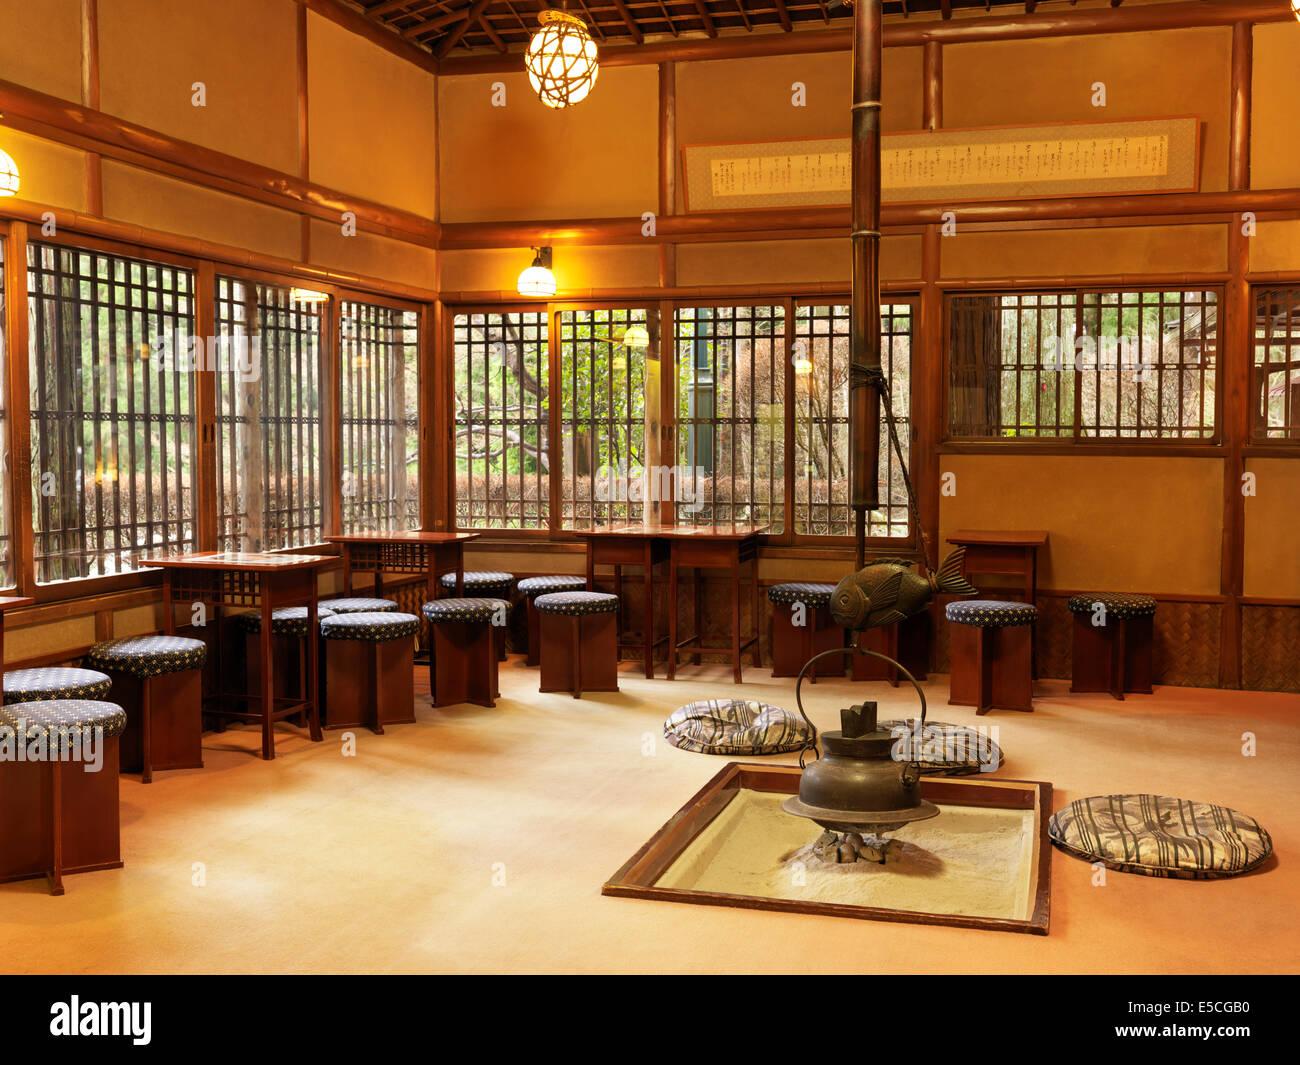 Public tea room at a restaurant in a Japanese ryokan hotel. Gero, Japan. - Stock Image